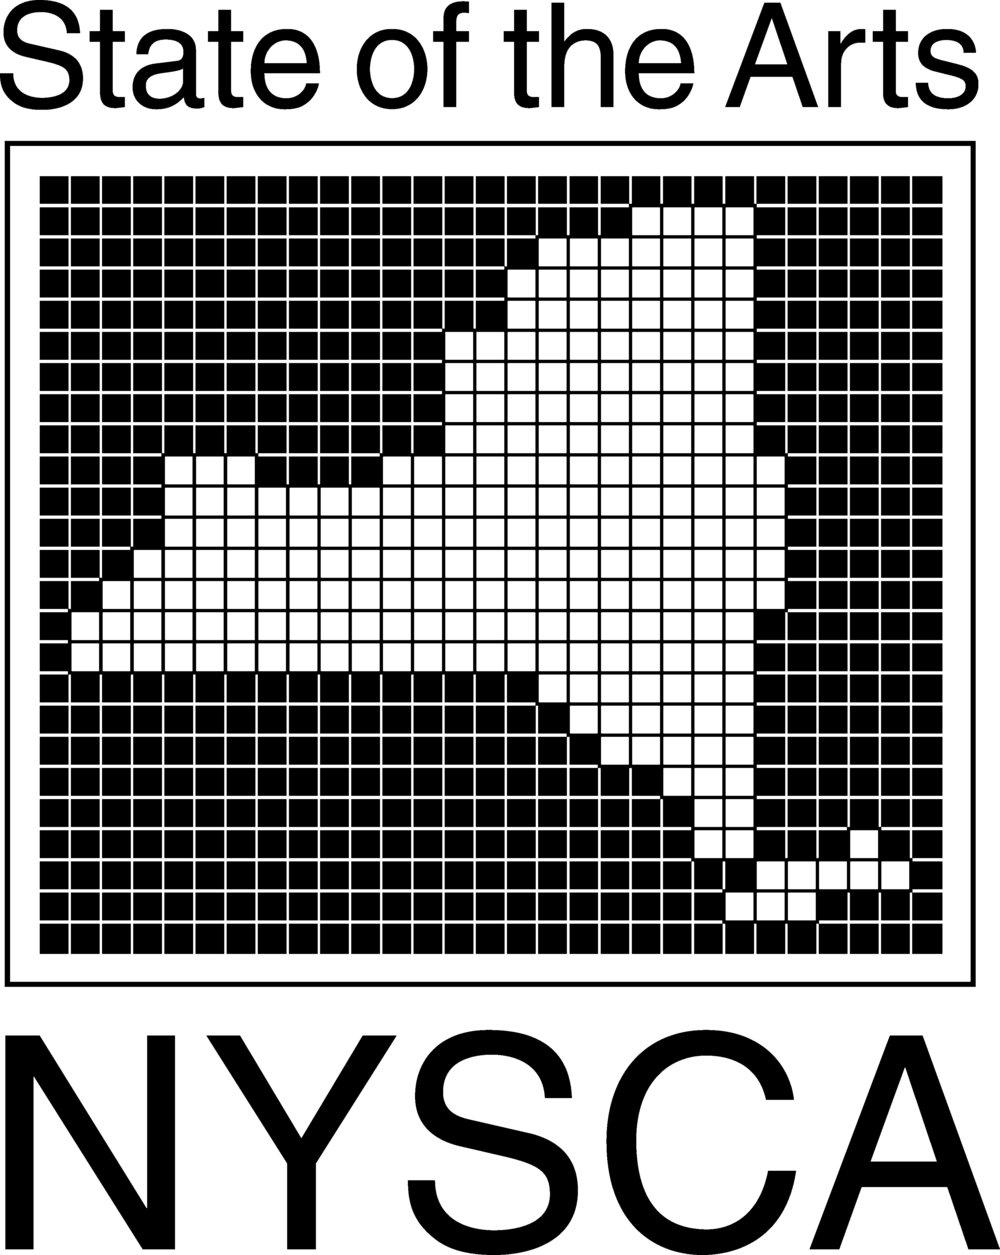 nysca_black.jpg